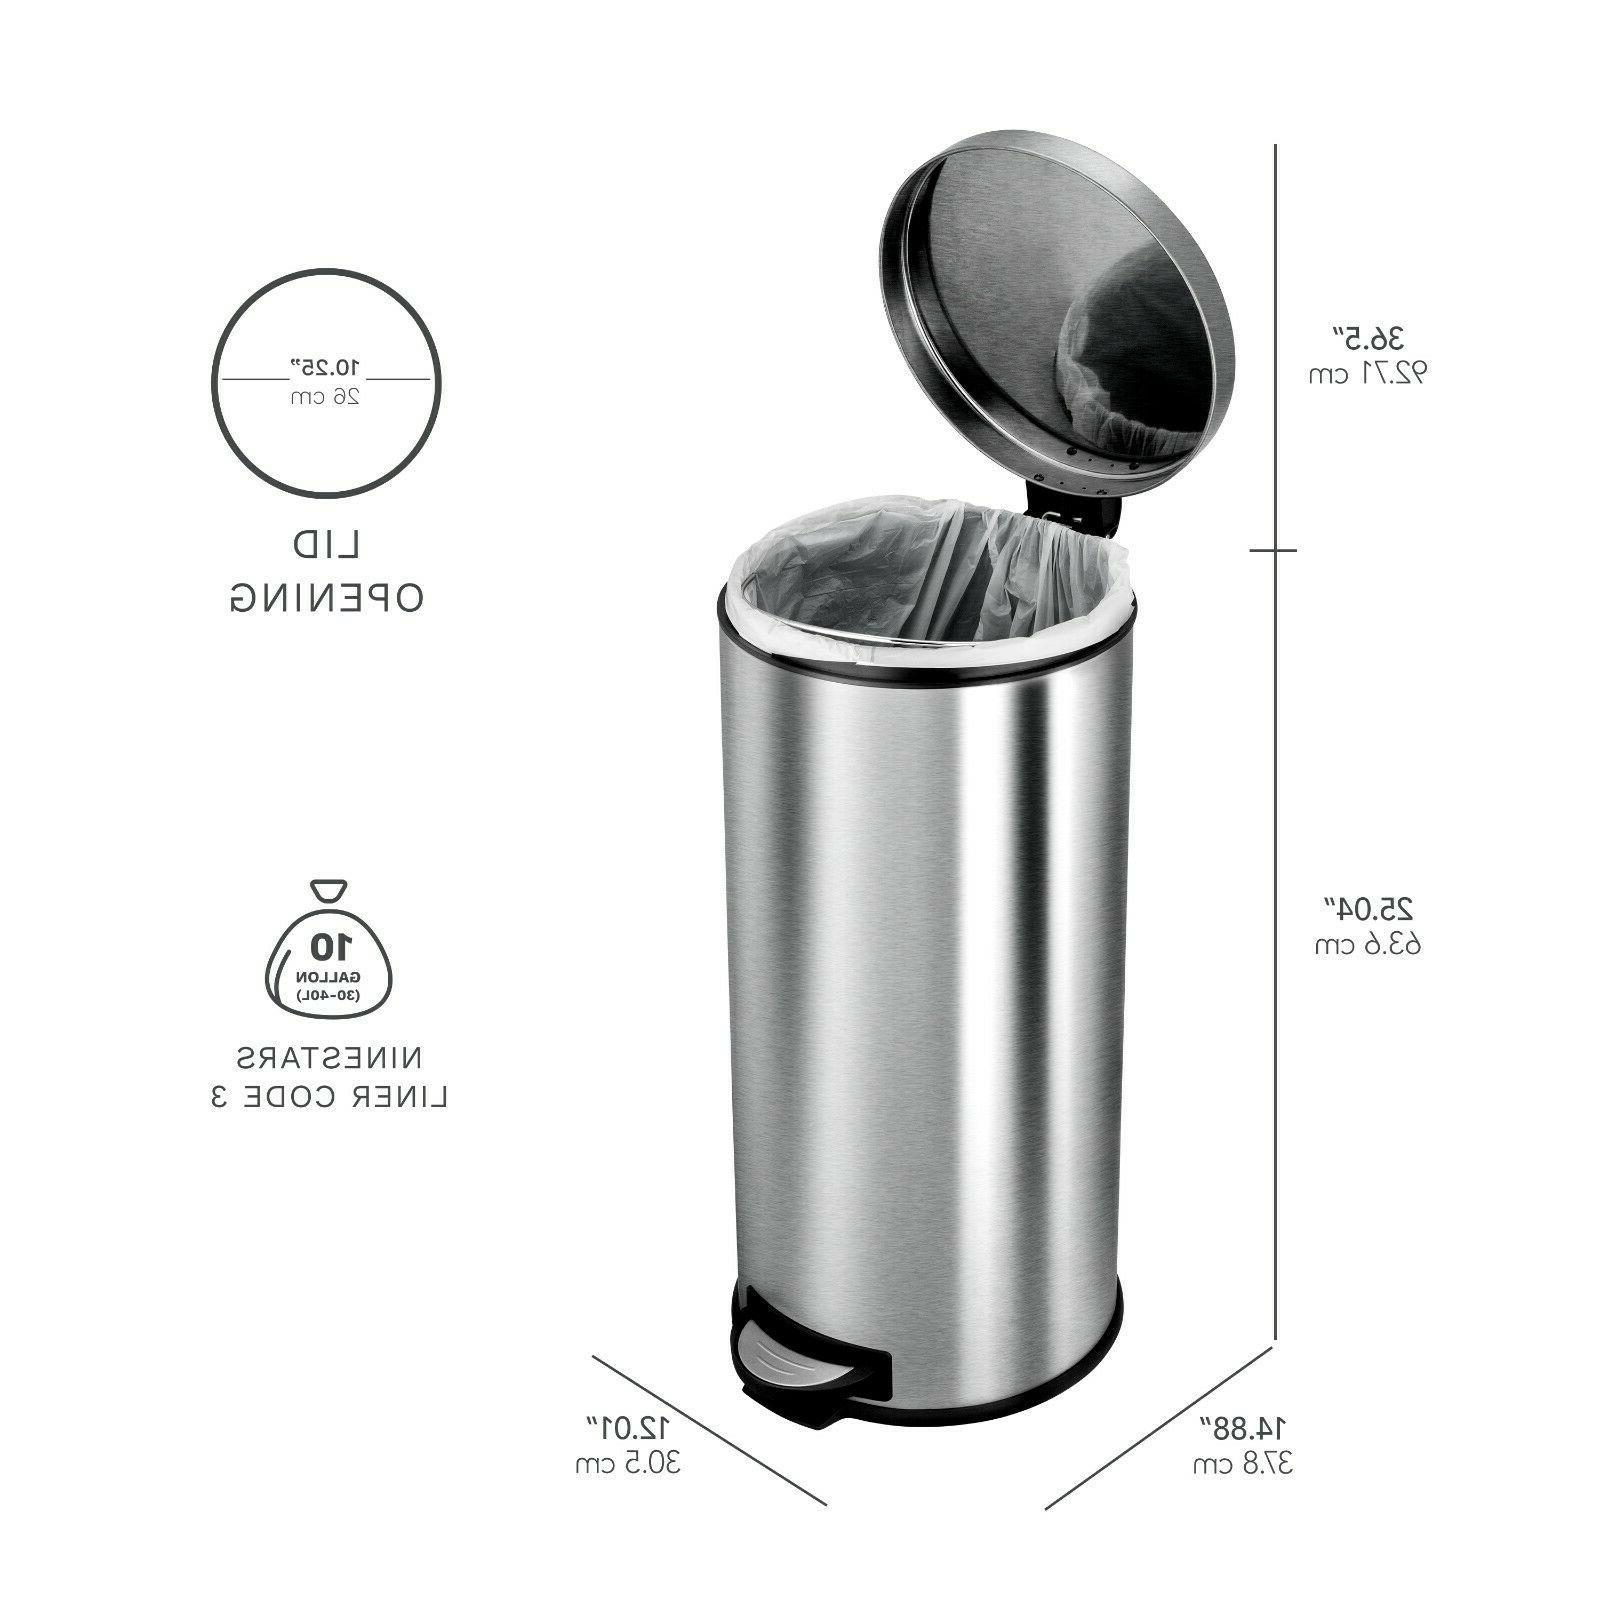 Silver 30L+5L Stainless Steel Step Can Bin Garbage Waste Bag